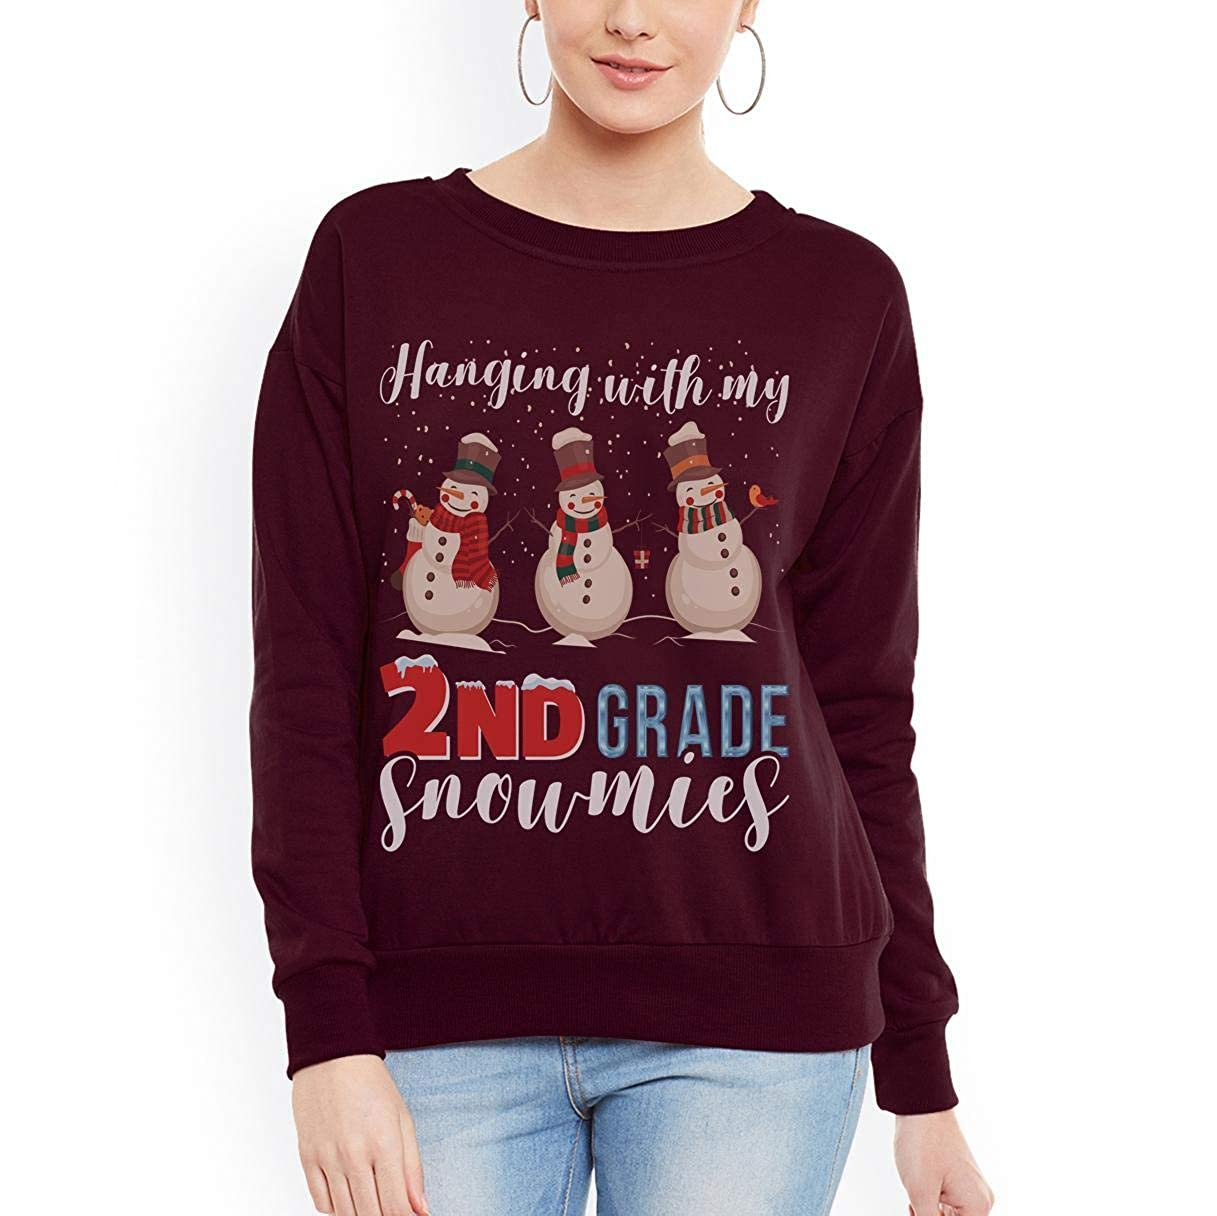 tee Snowman Teacher Hanging with My 2nd Grade Snowmies Women Sweatshirt